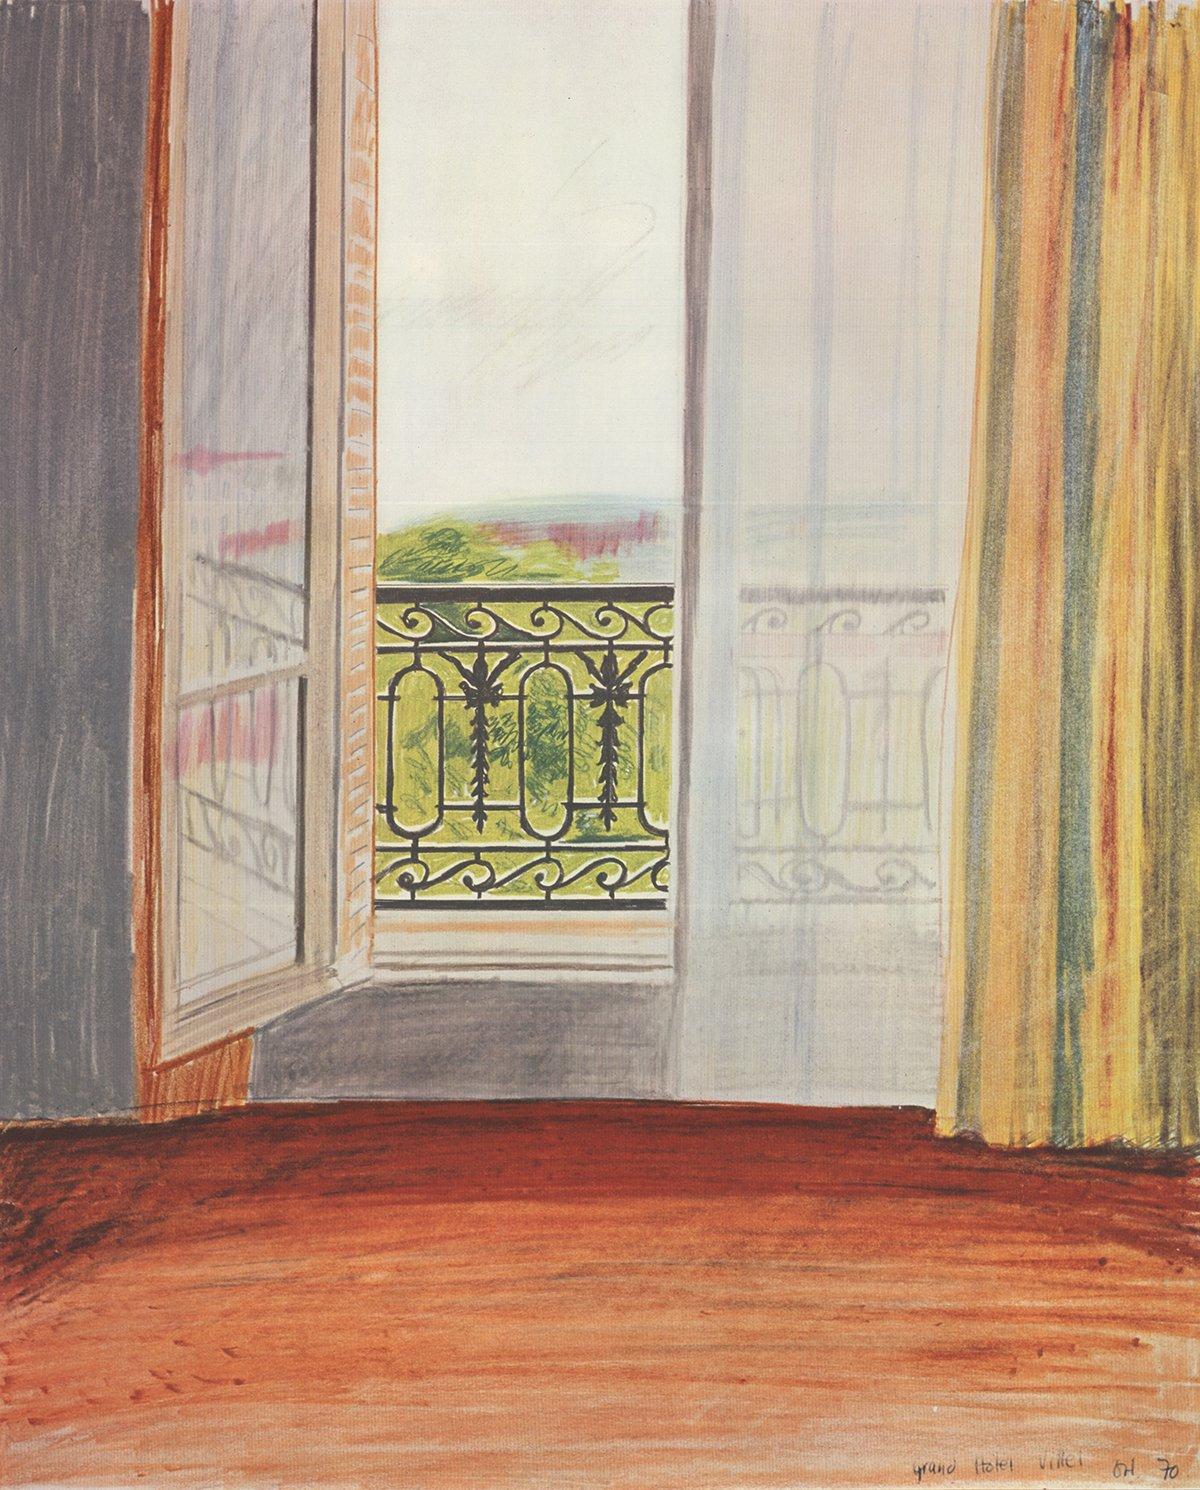 David Hockney-Window, Grand Hotel, Vittel- 19th NY Film Festival-1970 Poster